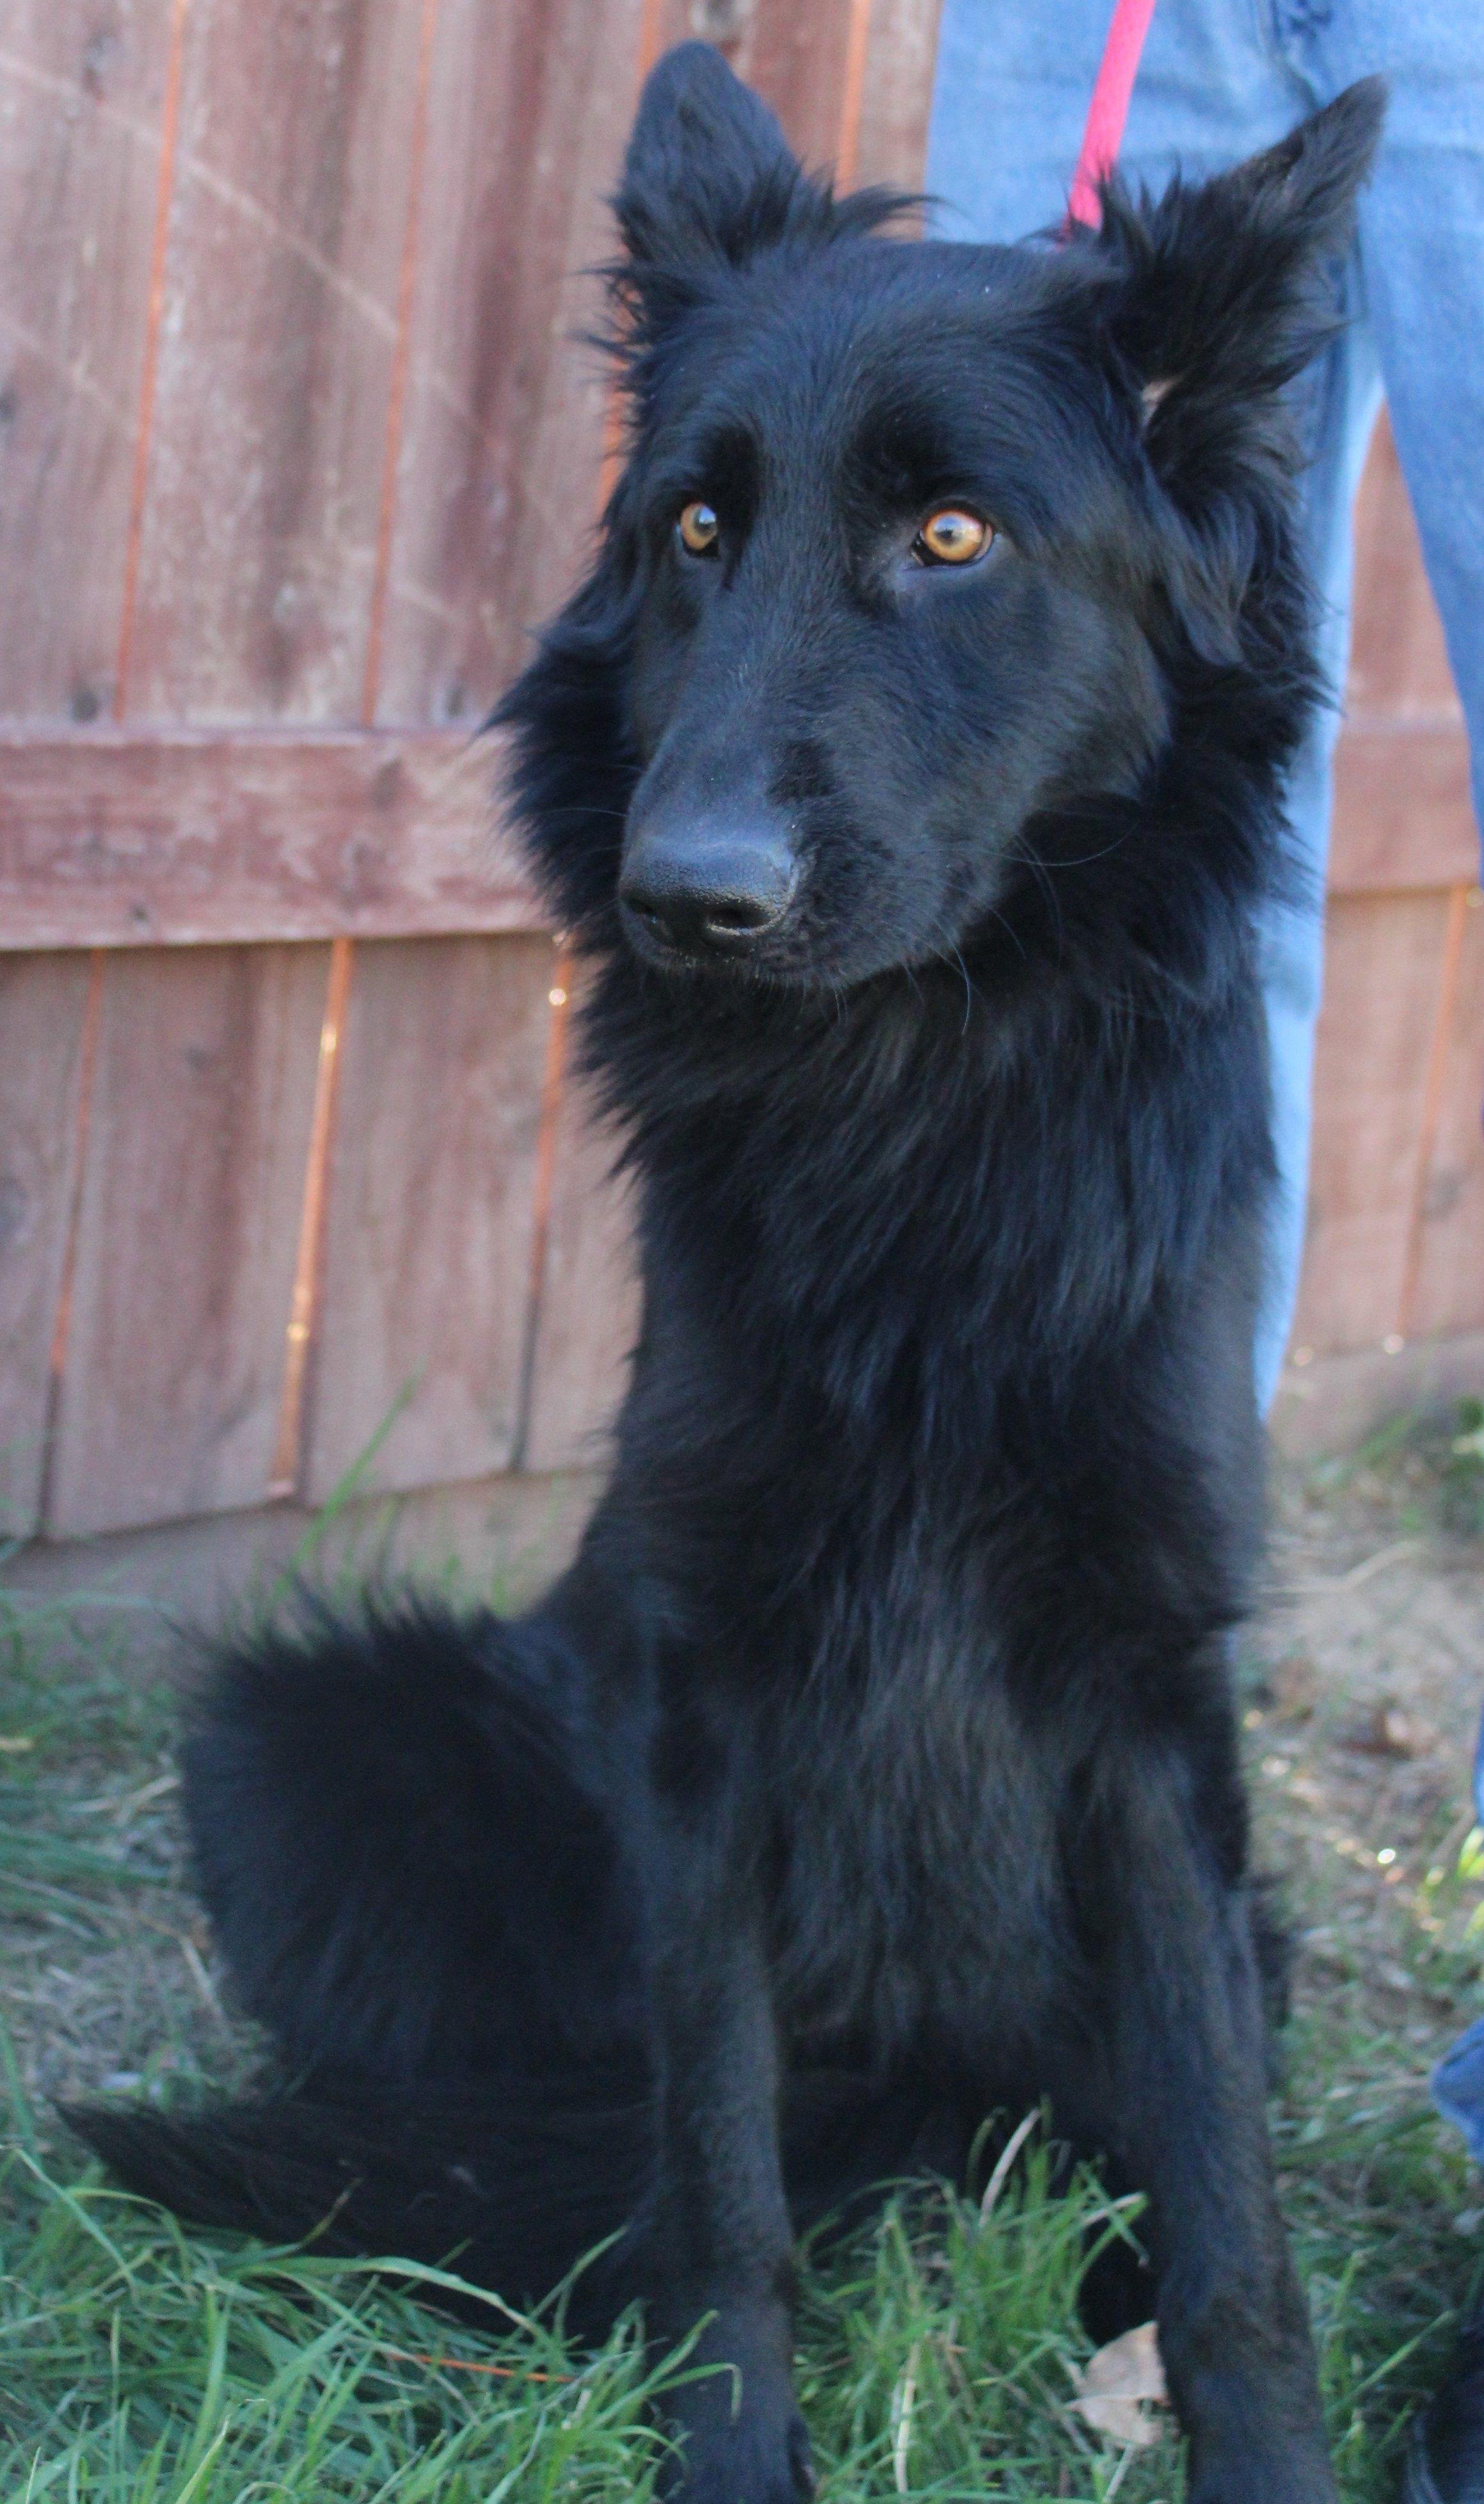 Reba is an adoptable belgian shepherd / sheepdog searching